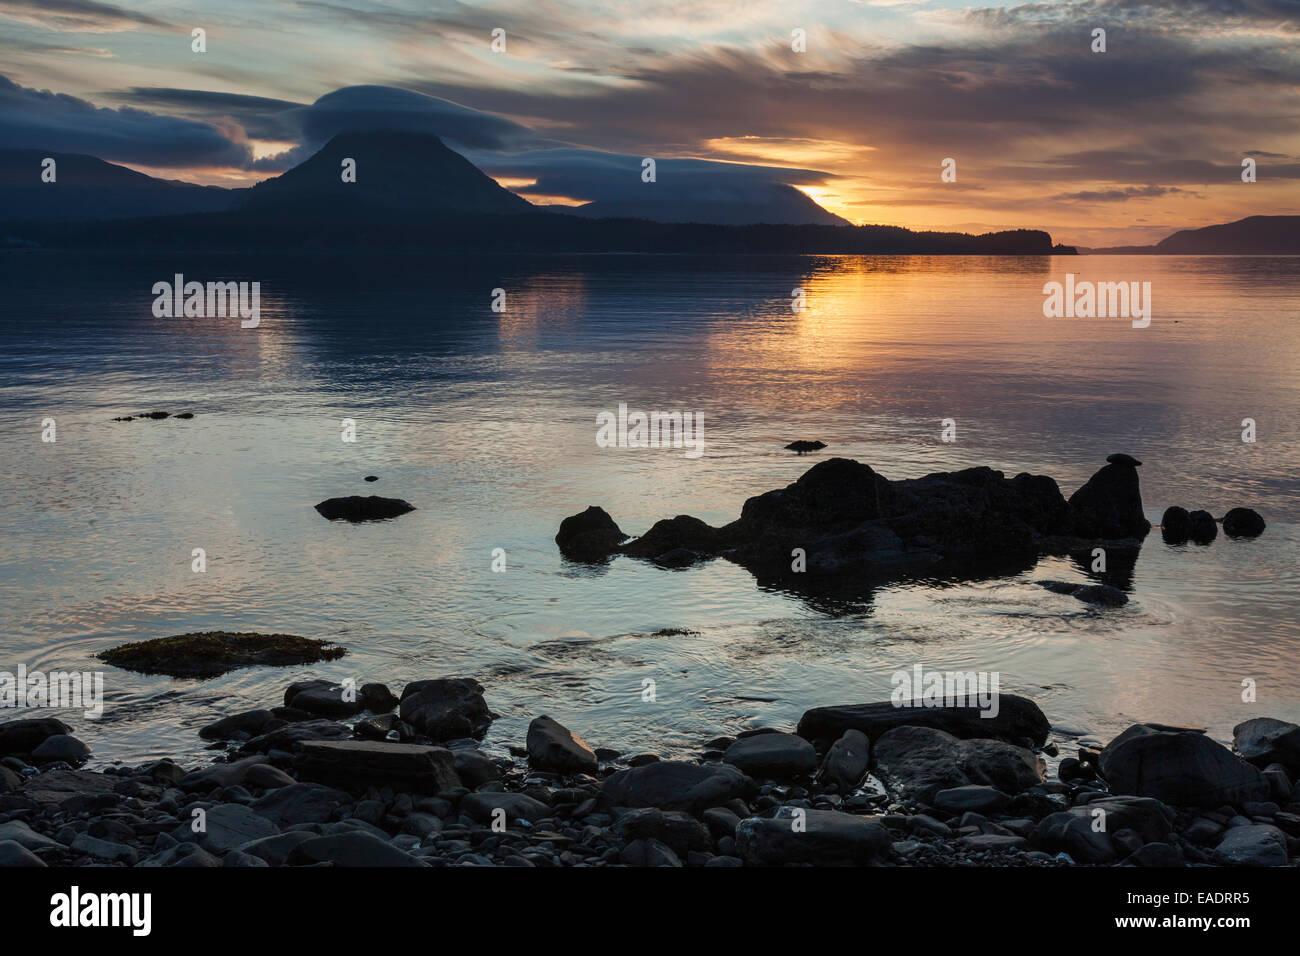 Puesta de sol a lo largo de las costas de Ambercrombie State Park, la isla Kodiak, Alaska. Imagen De Stock